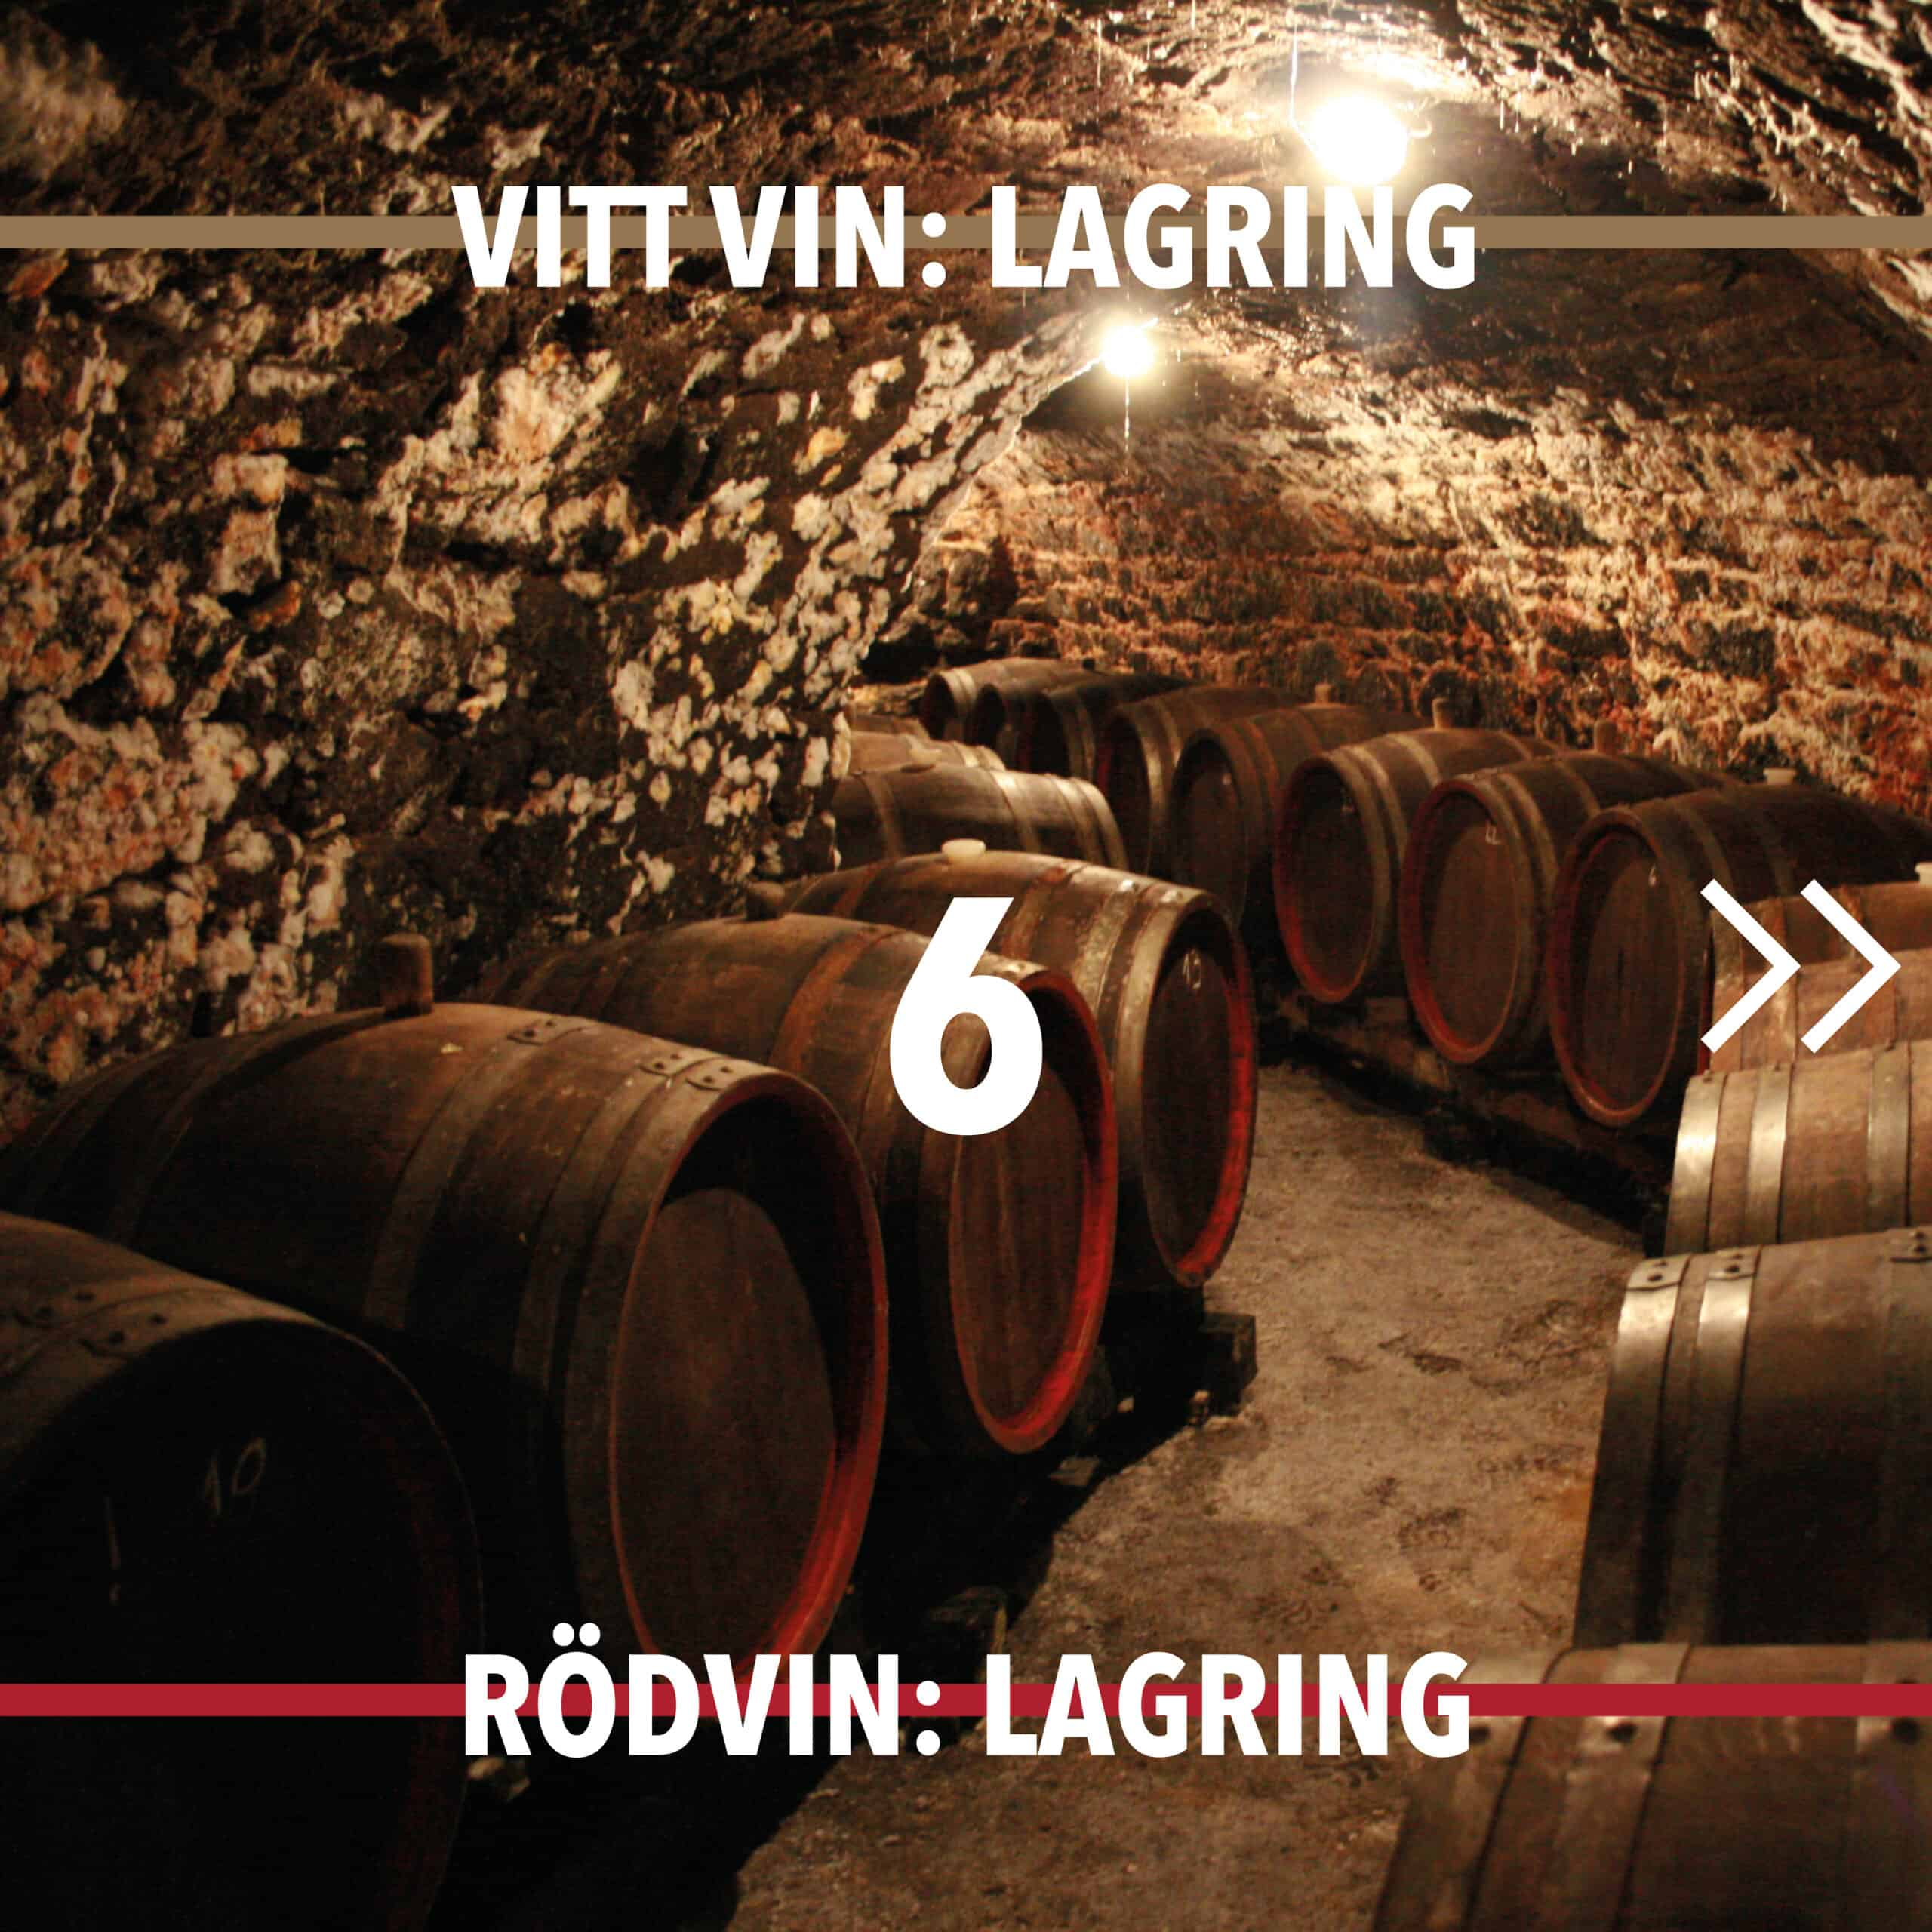 Vintillverkning guide hungry wines: lagring